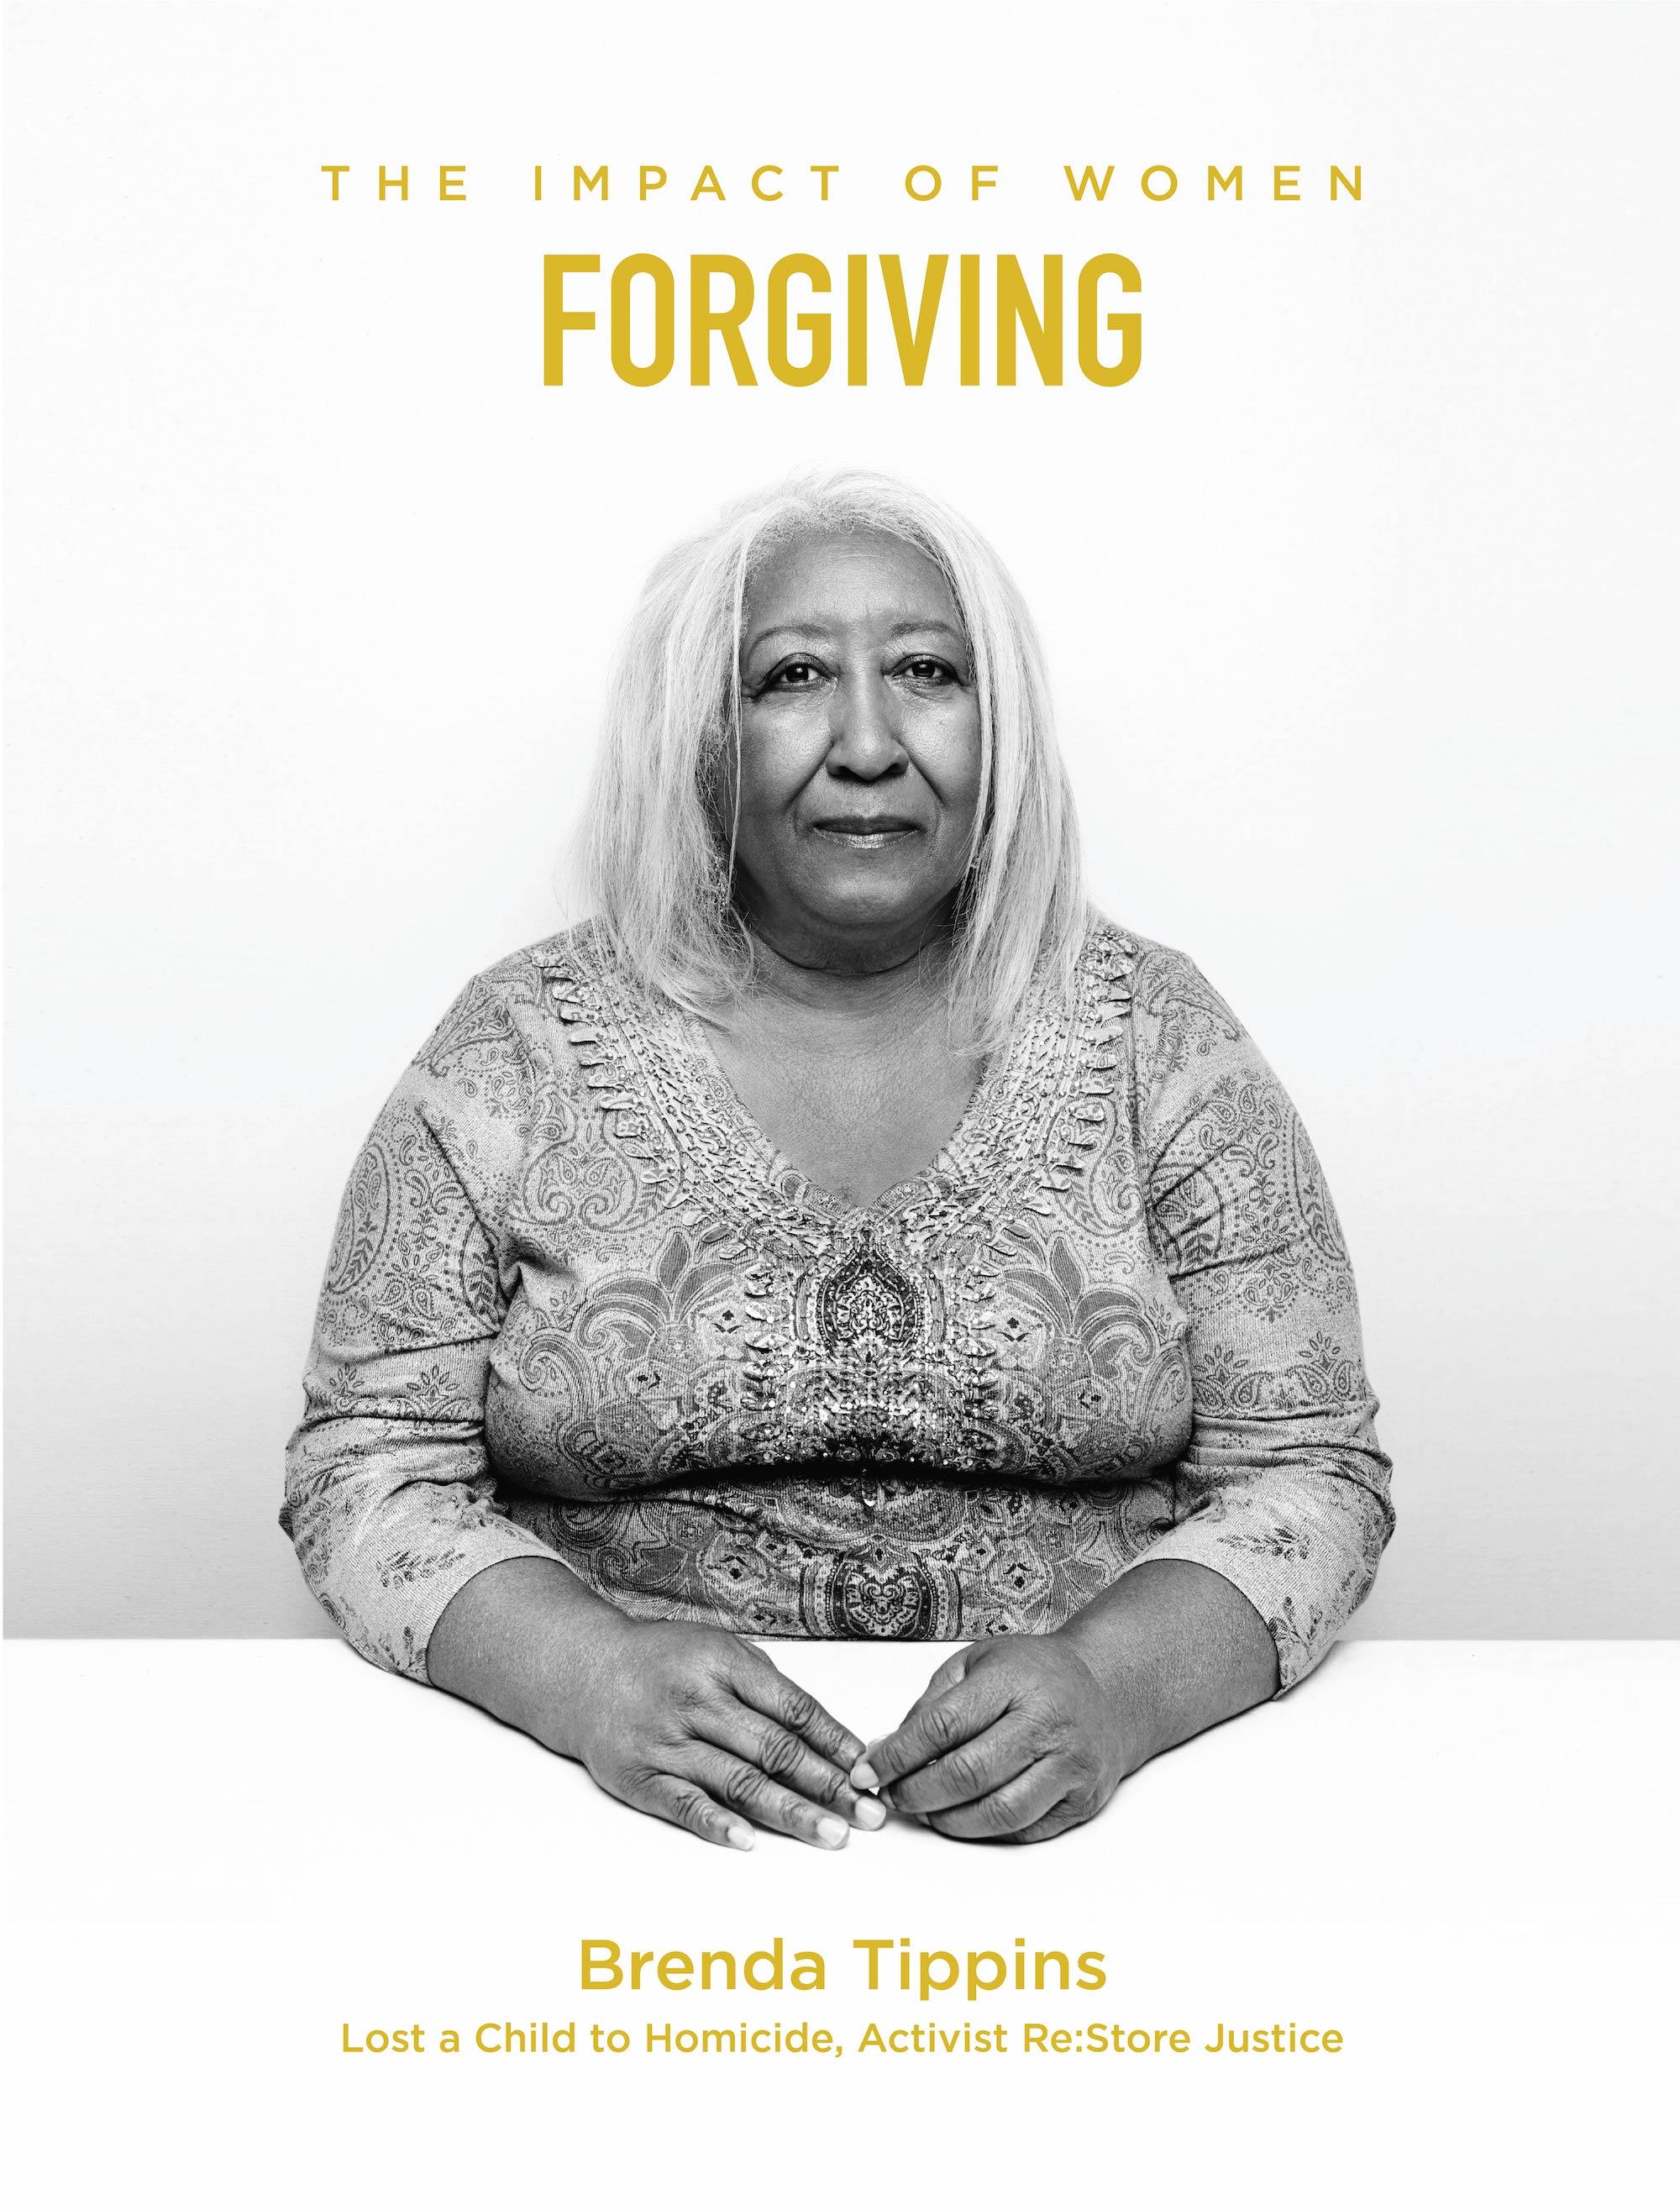 Brenda Tippins is Forgiving